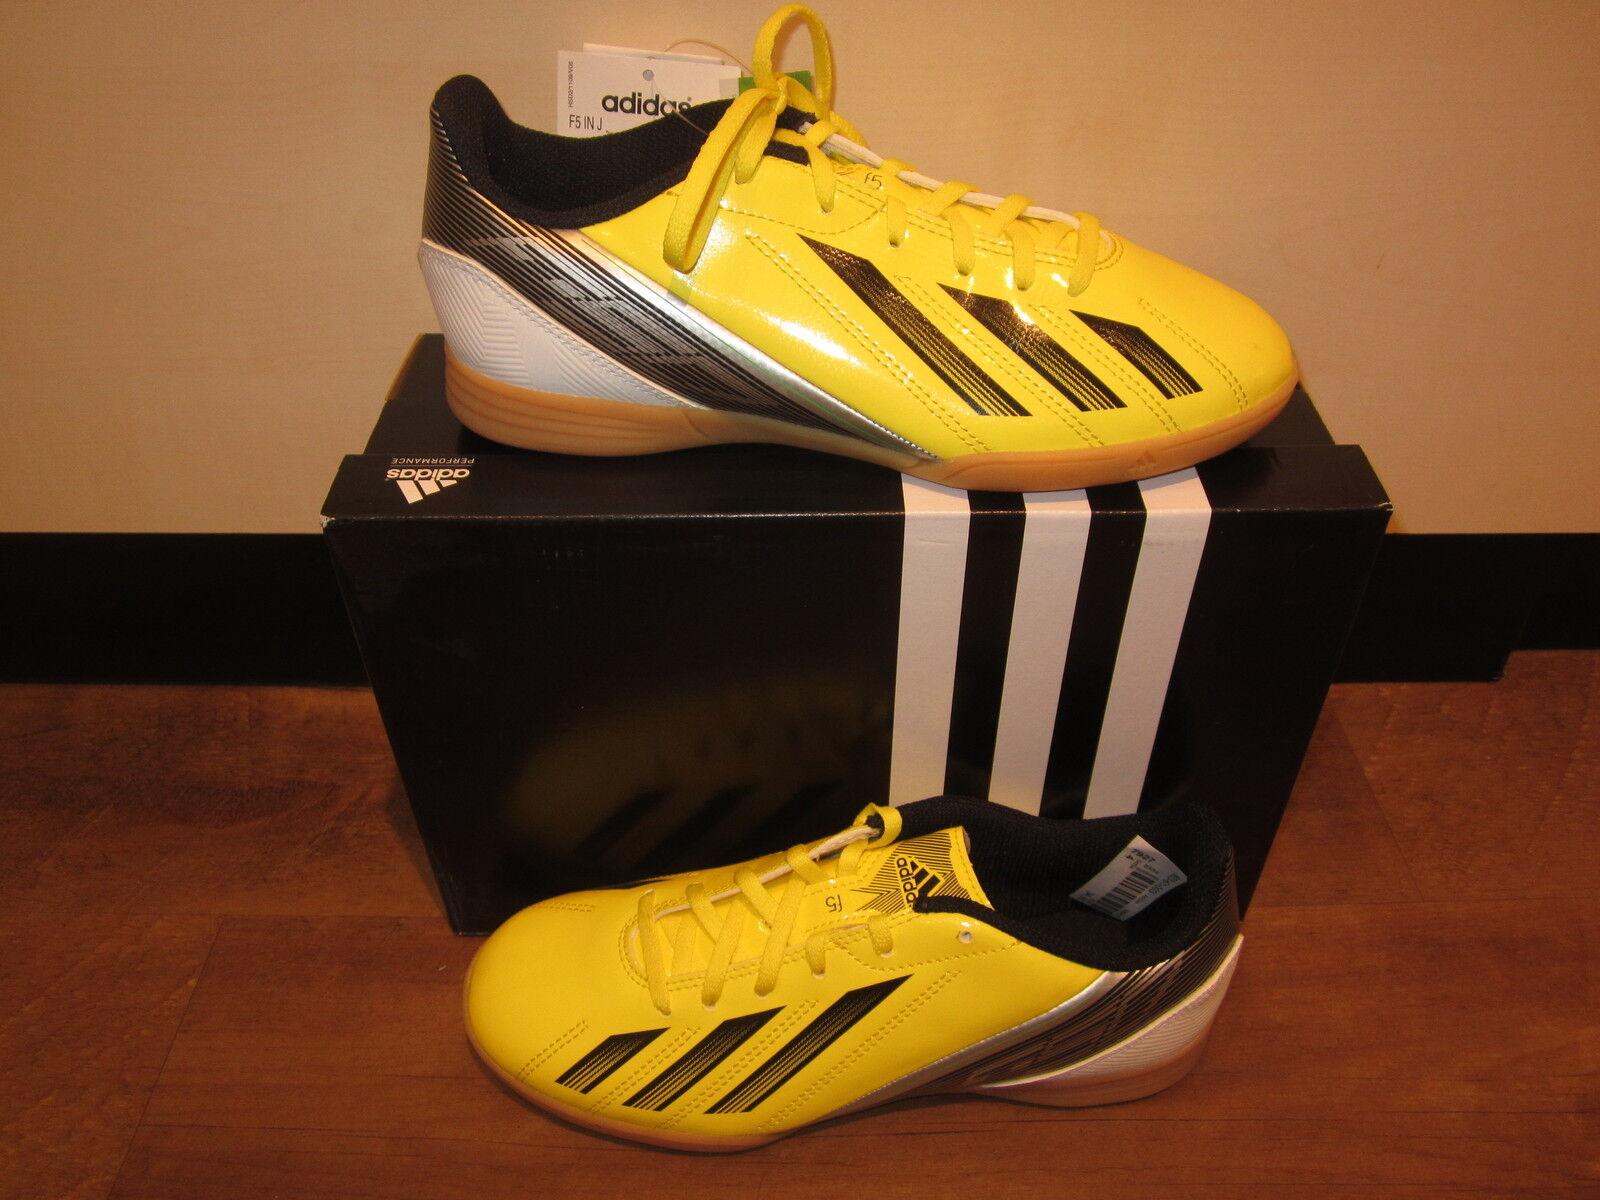 Adidas Calzado Deportivo  F5 In J  Amarillo Negro blancoo Nuevo